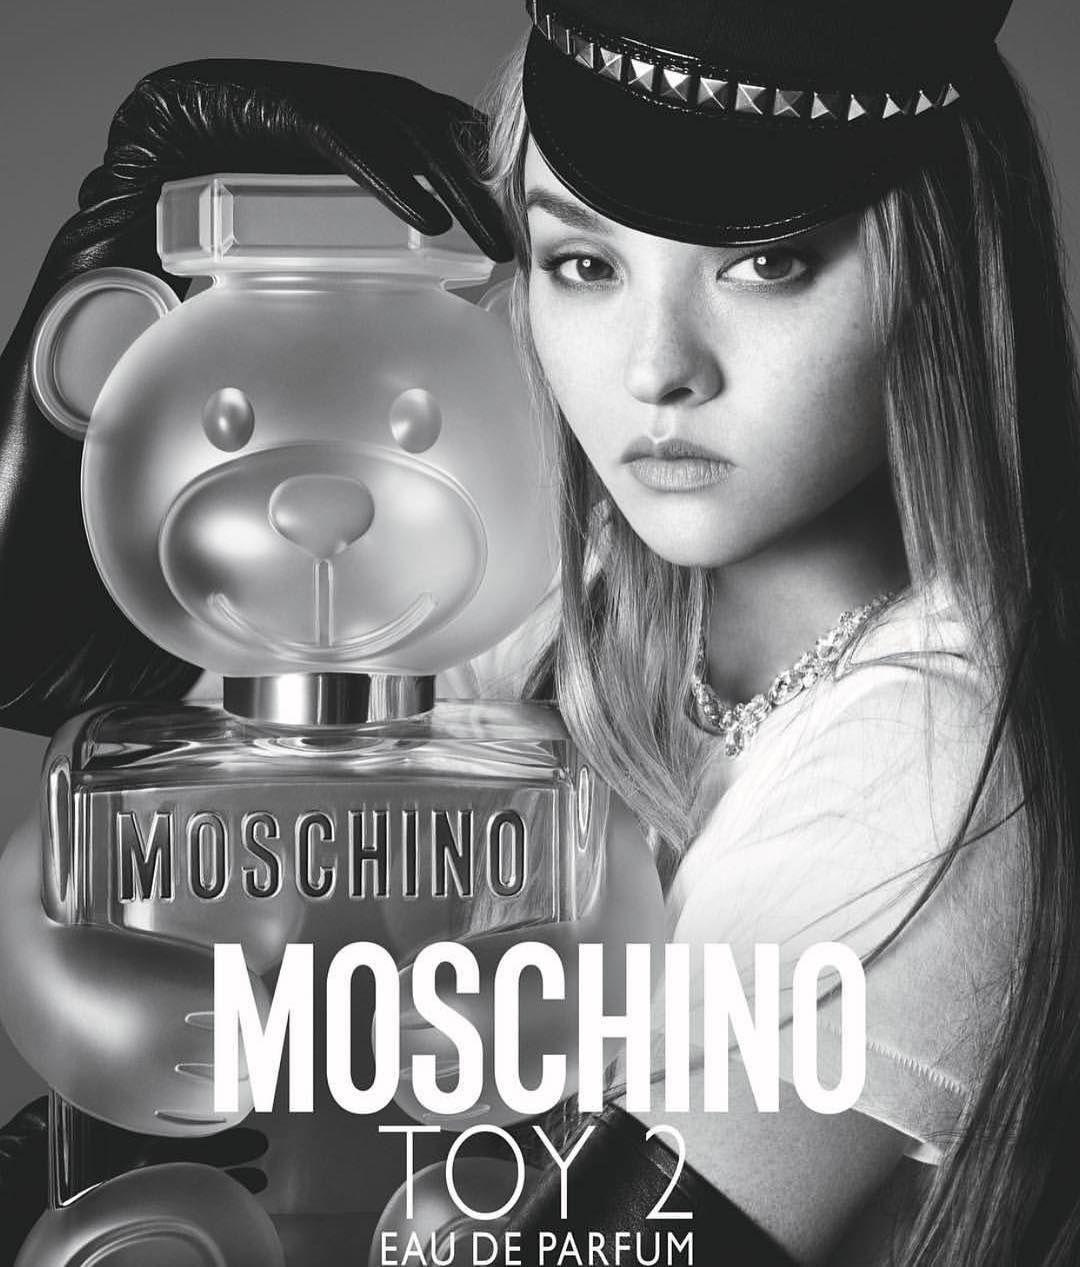 Toy Moschino Steven Eau 2 ParfumParfums MeiselEt De 6ybYf7g